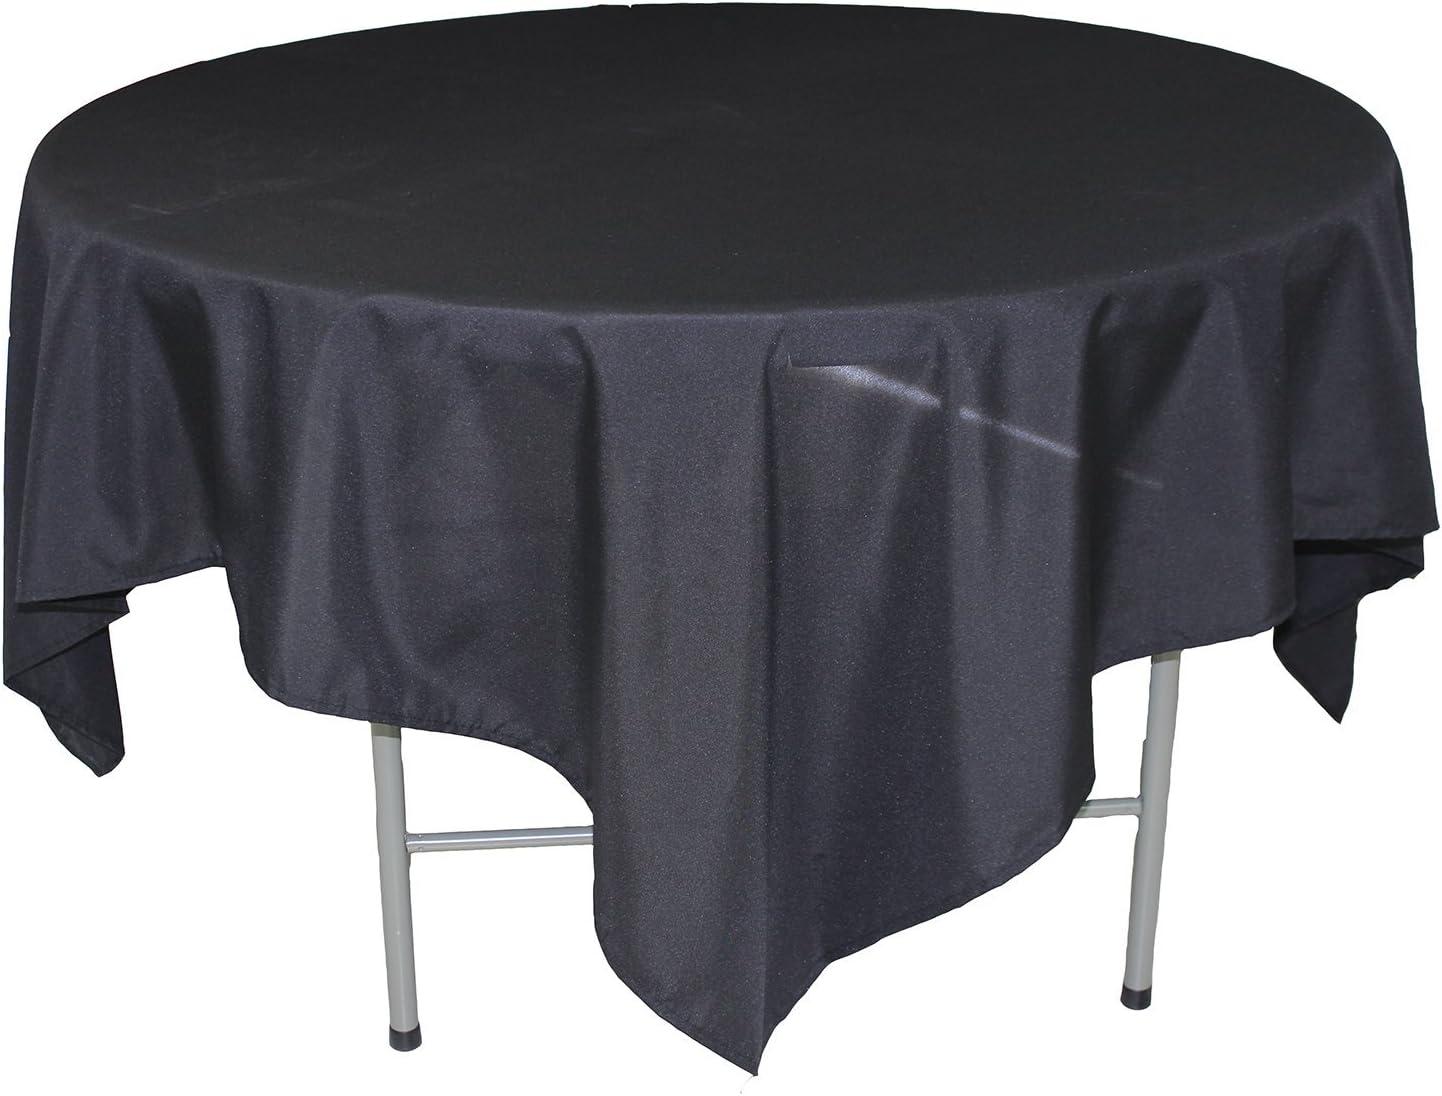 70-inch White KAITATSU SEN Square Polyester Fabric Tablecloth